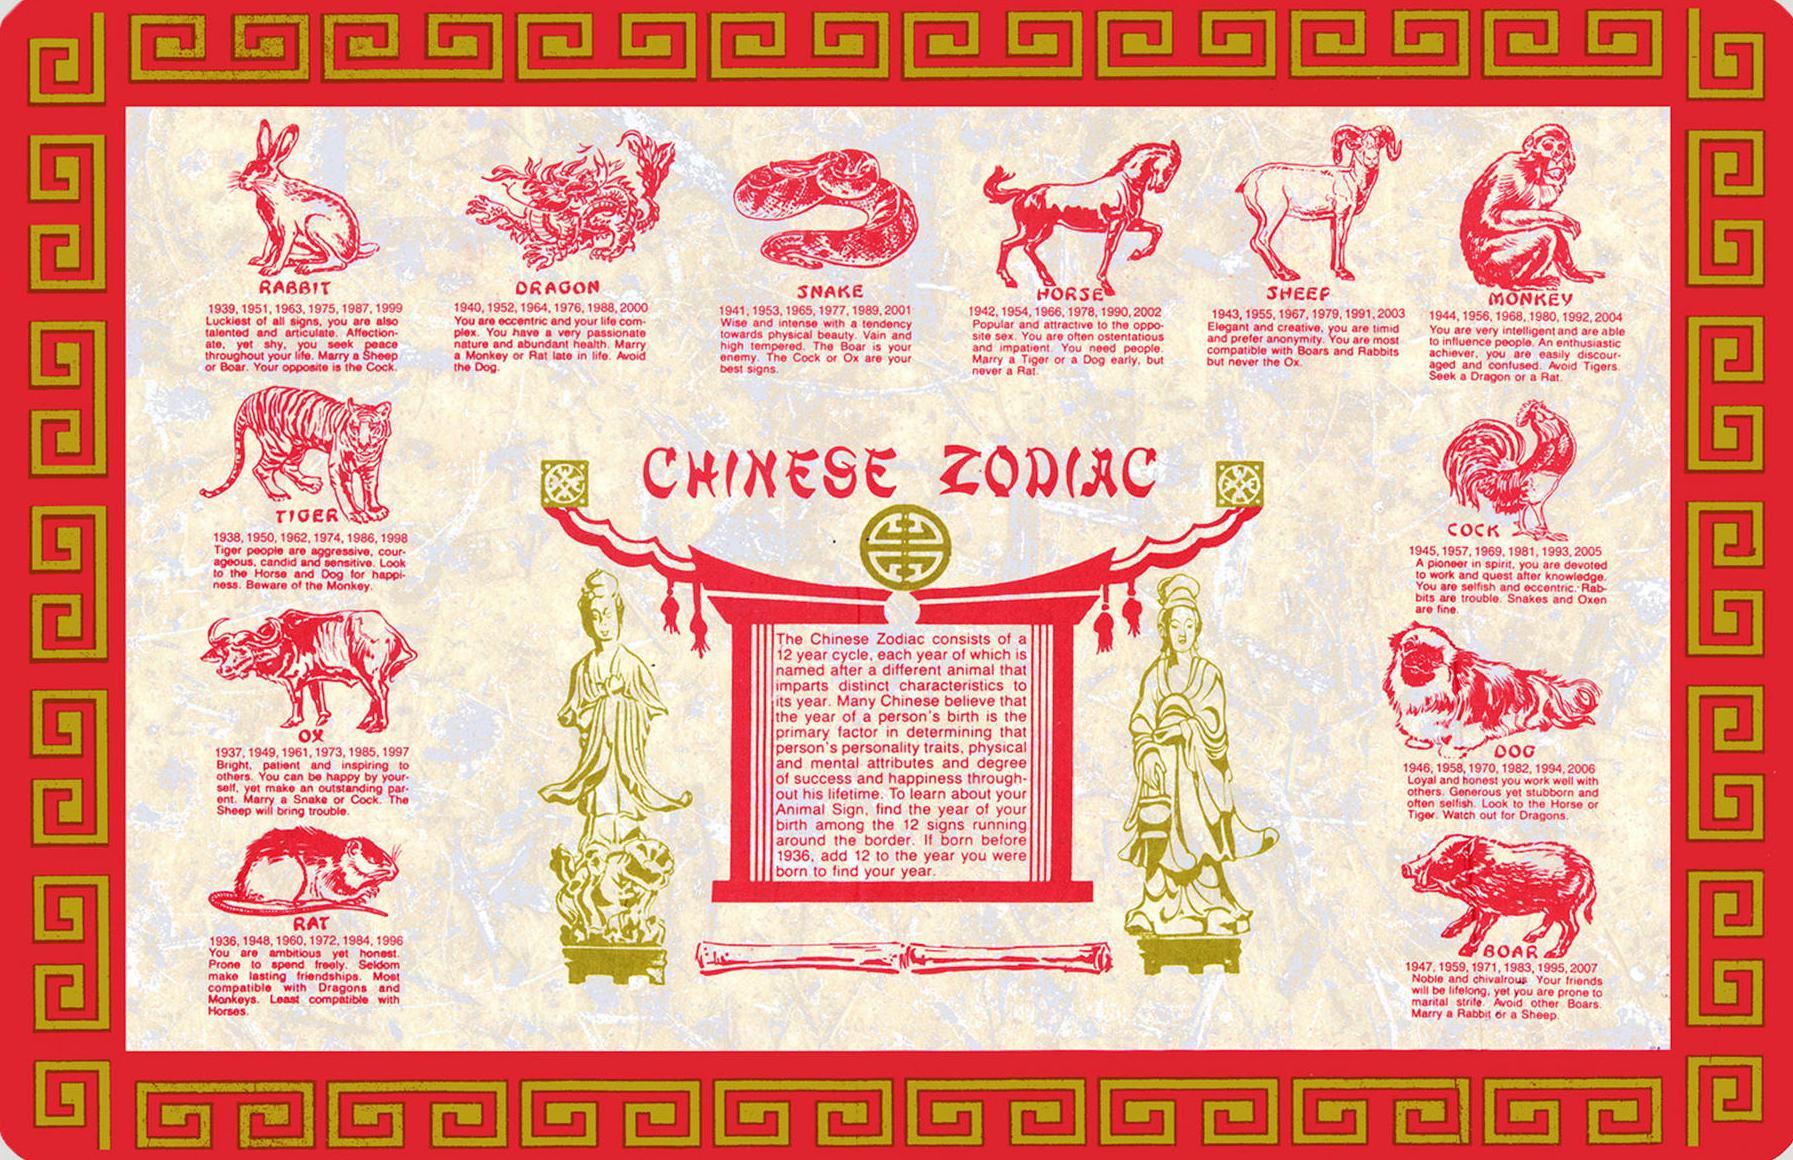 The Chinese Zodiac Calendar